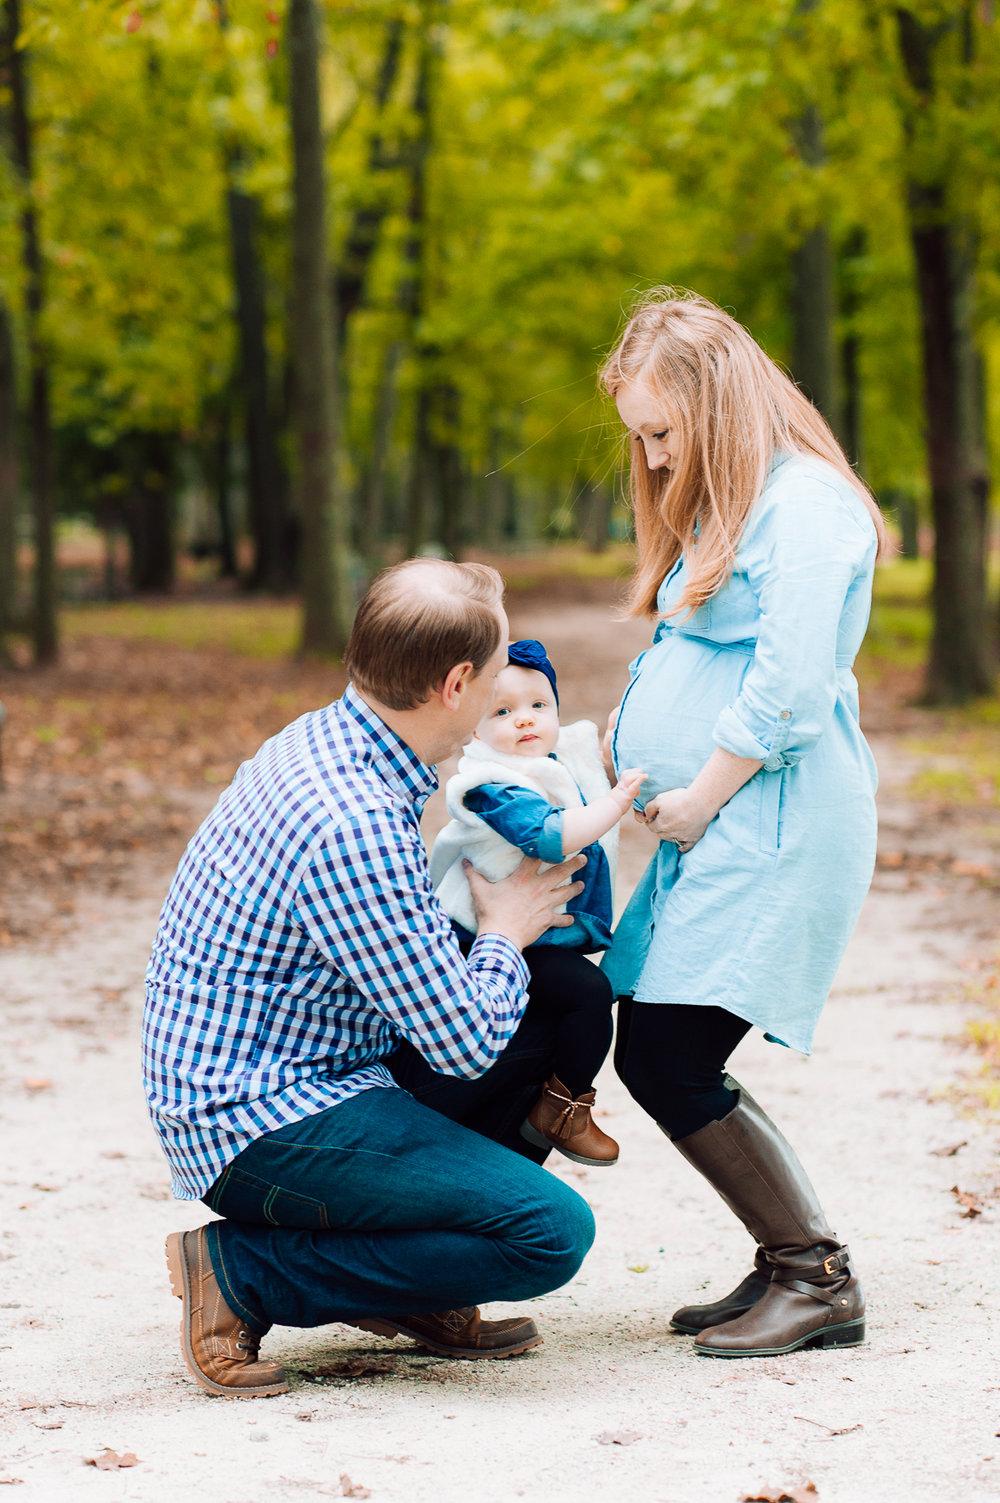 maternity_fallphotos_fredericksburgphotographer_leesylvania_youseephotography_Heather (6).jpg